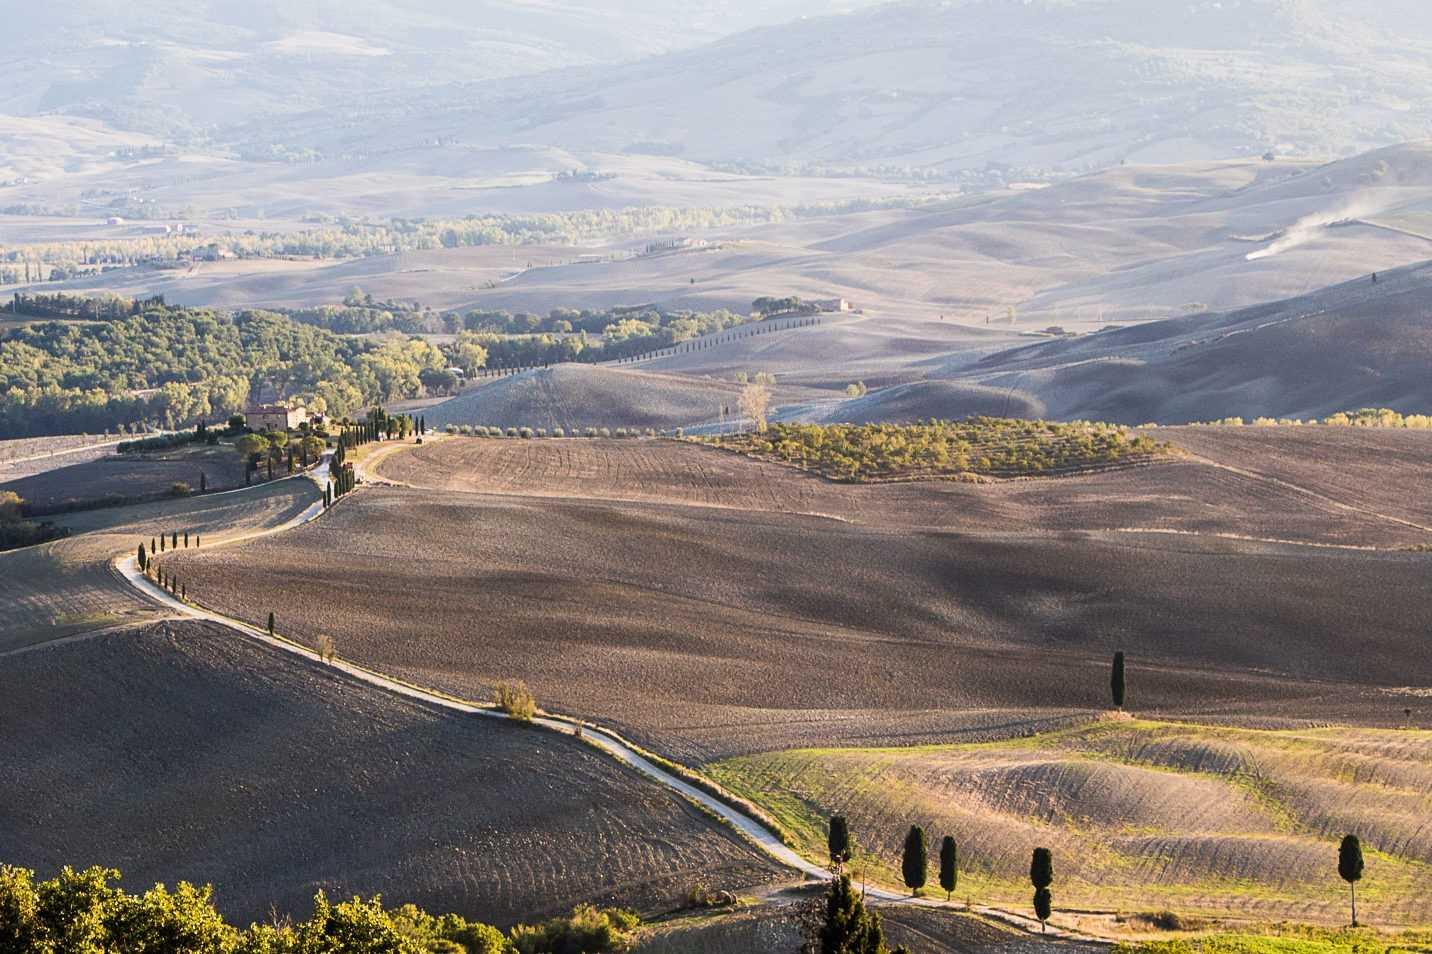 Toskania-poludniowa-blog